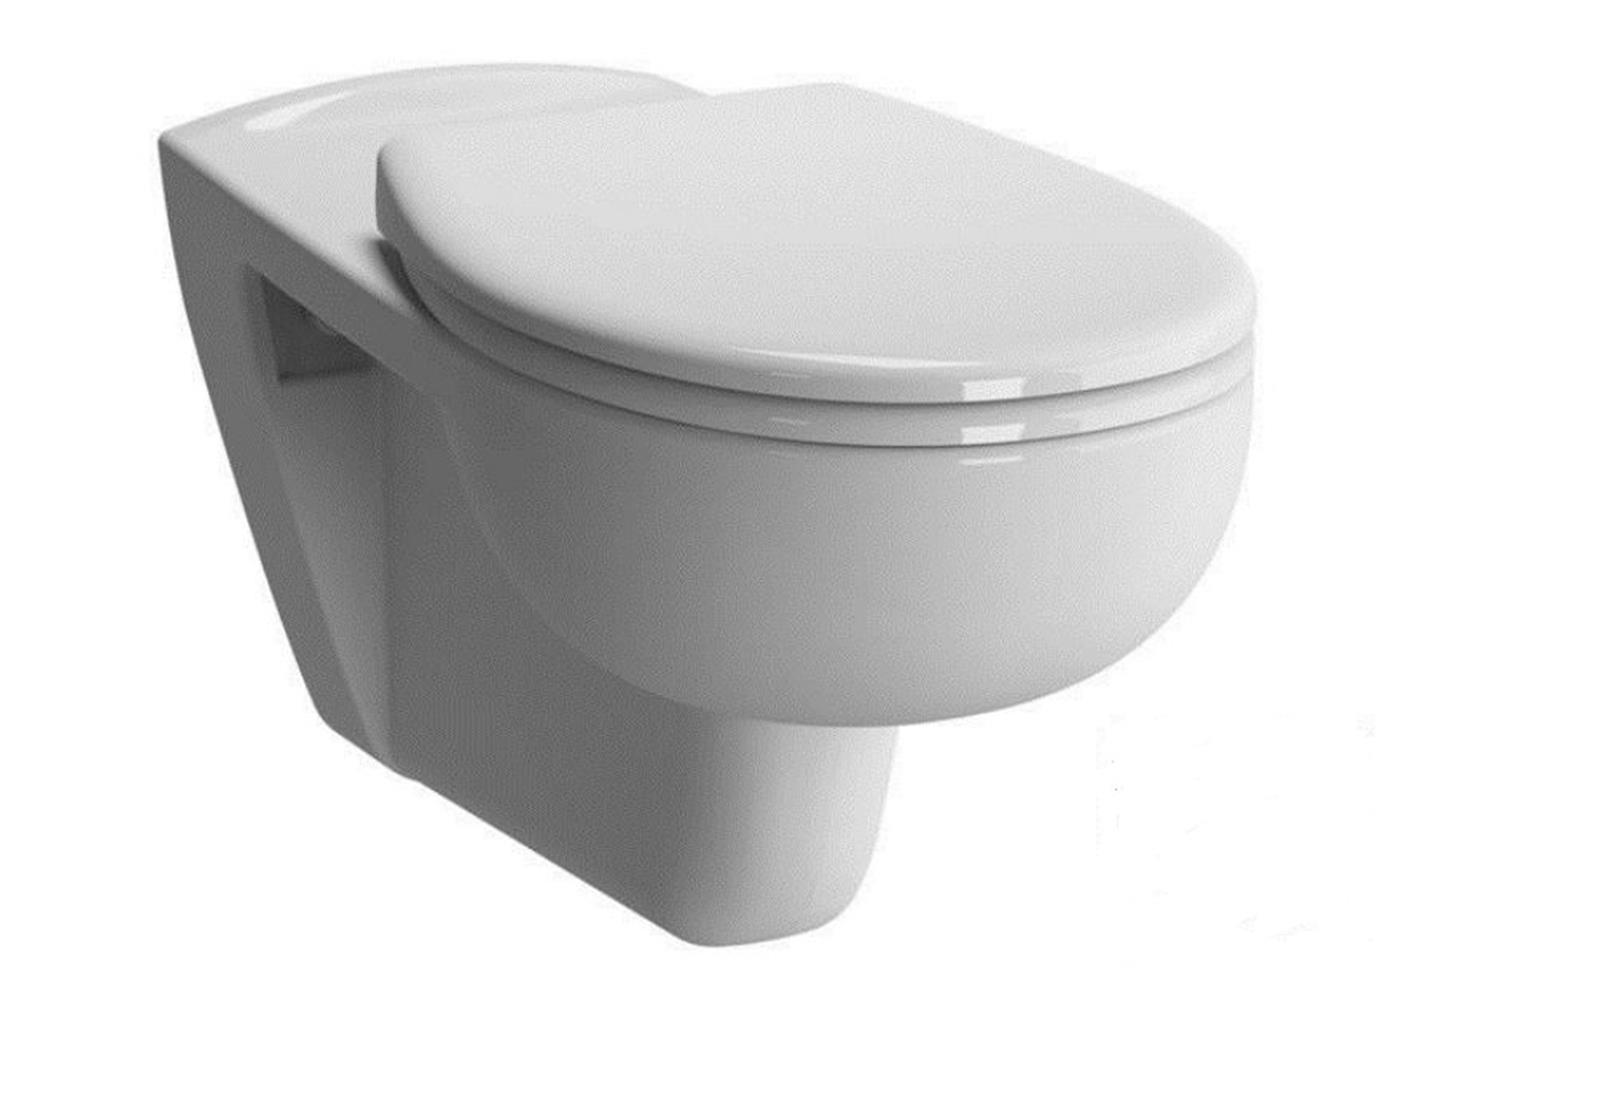 sanitaire wc pmr. Black Bedroom Furniture Sets. Home Design Ideas